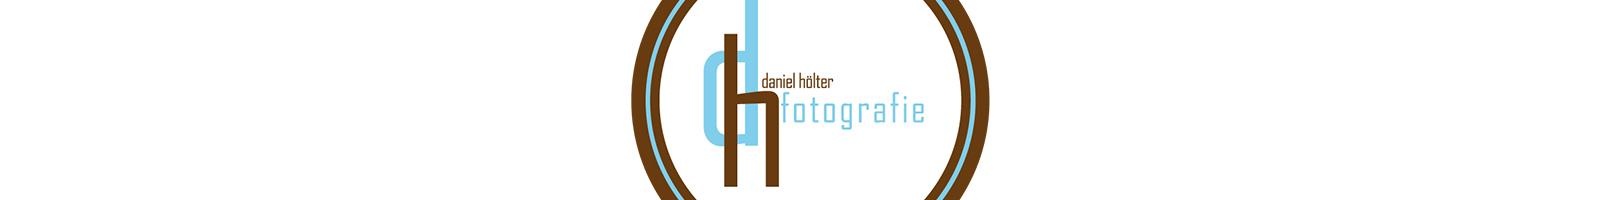 DanielHölterFotografie2